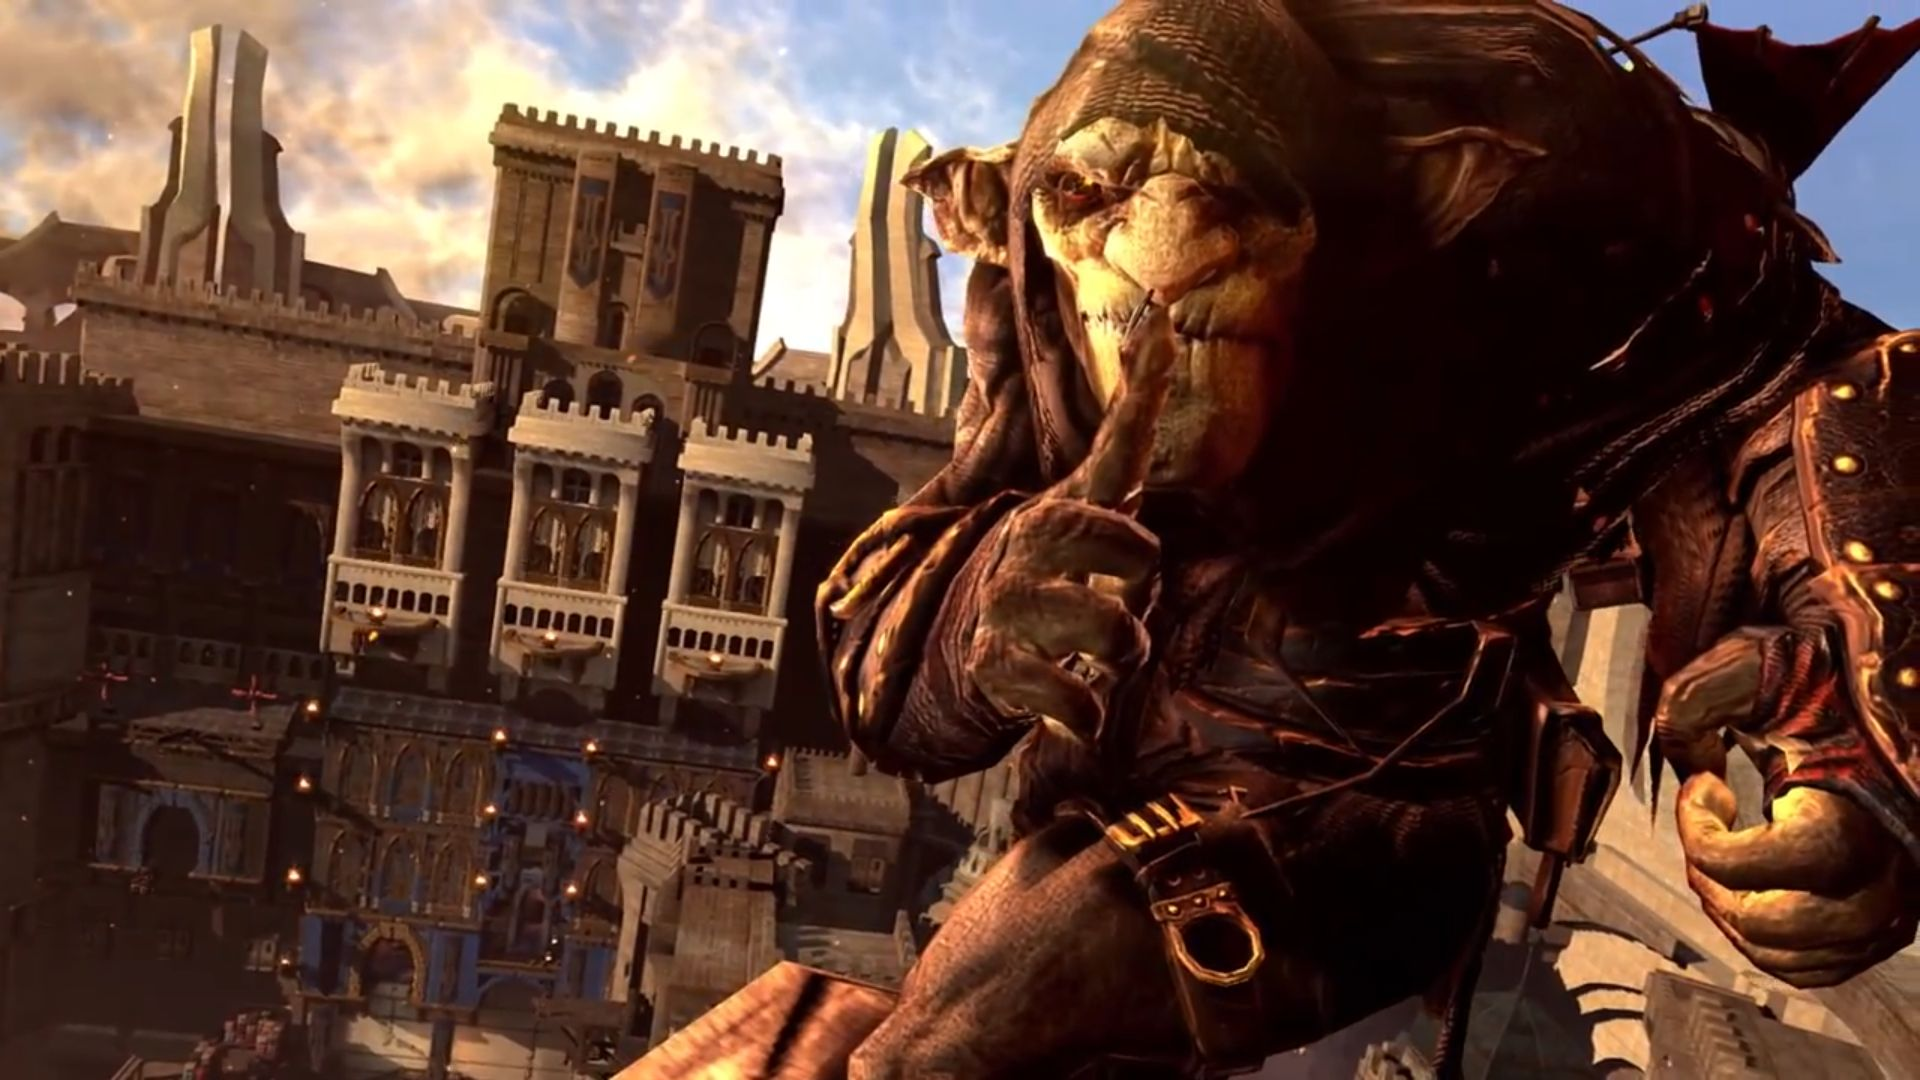 Styx Master of Shadows Le trailer de lancement 1920x1080